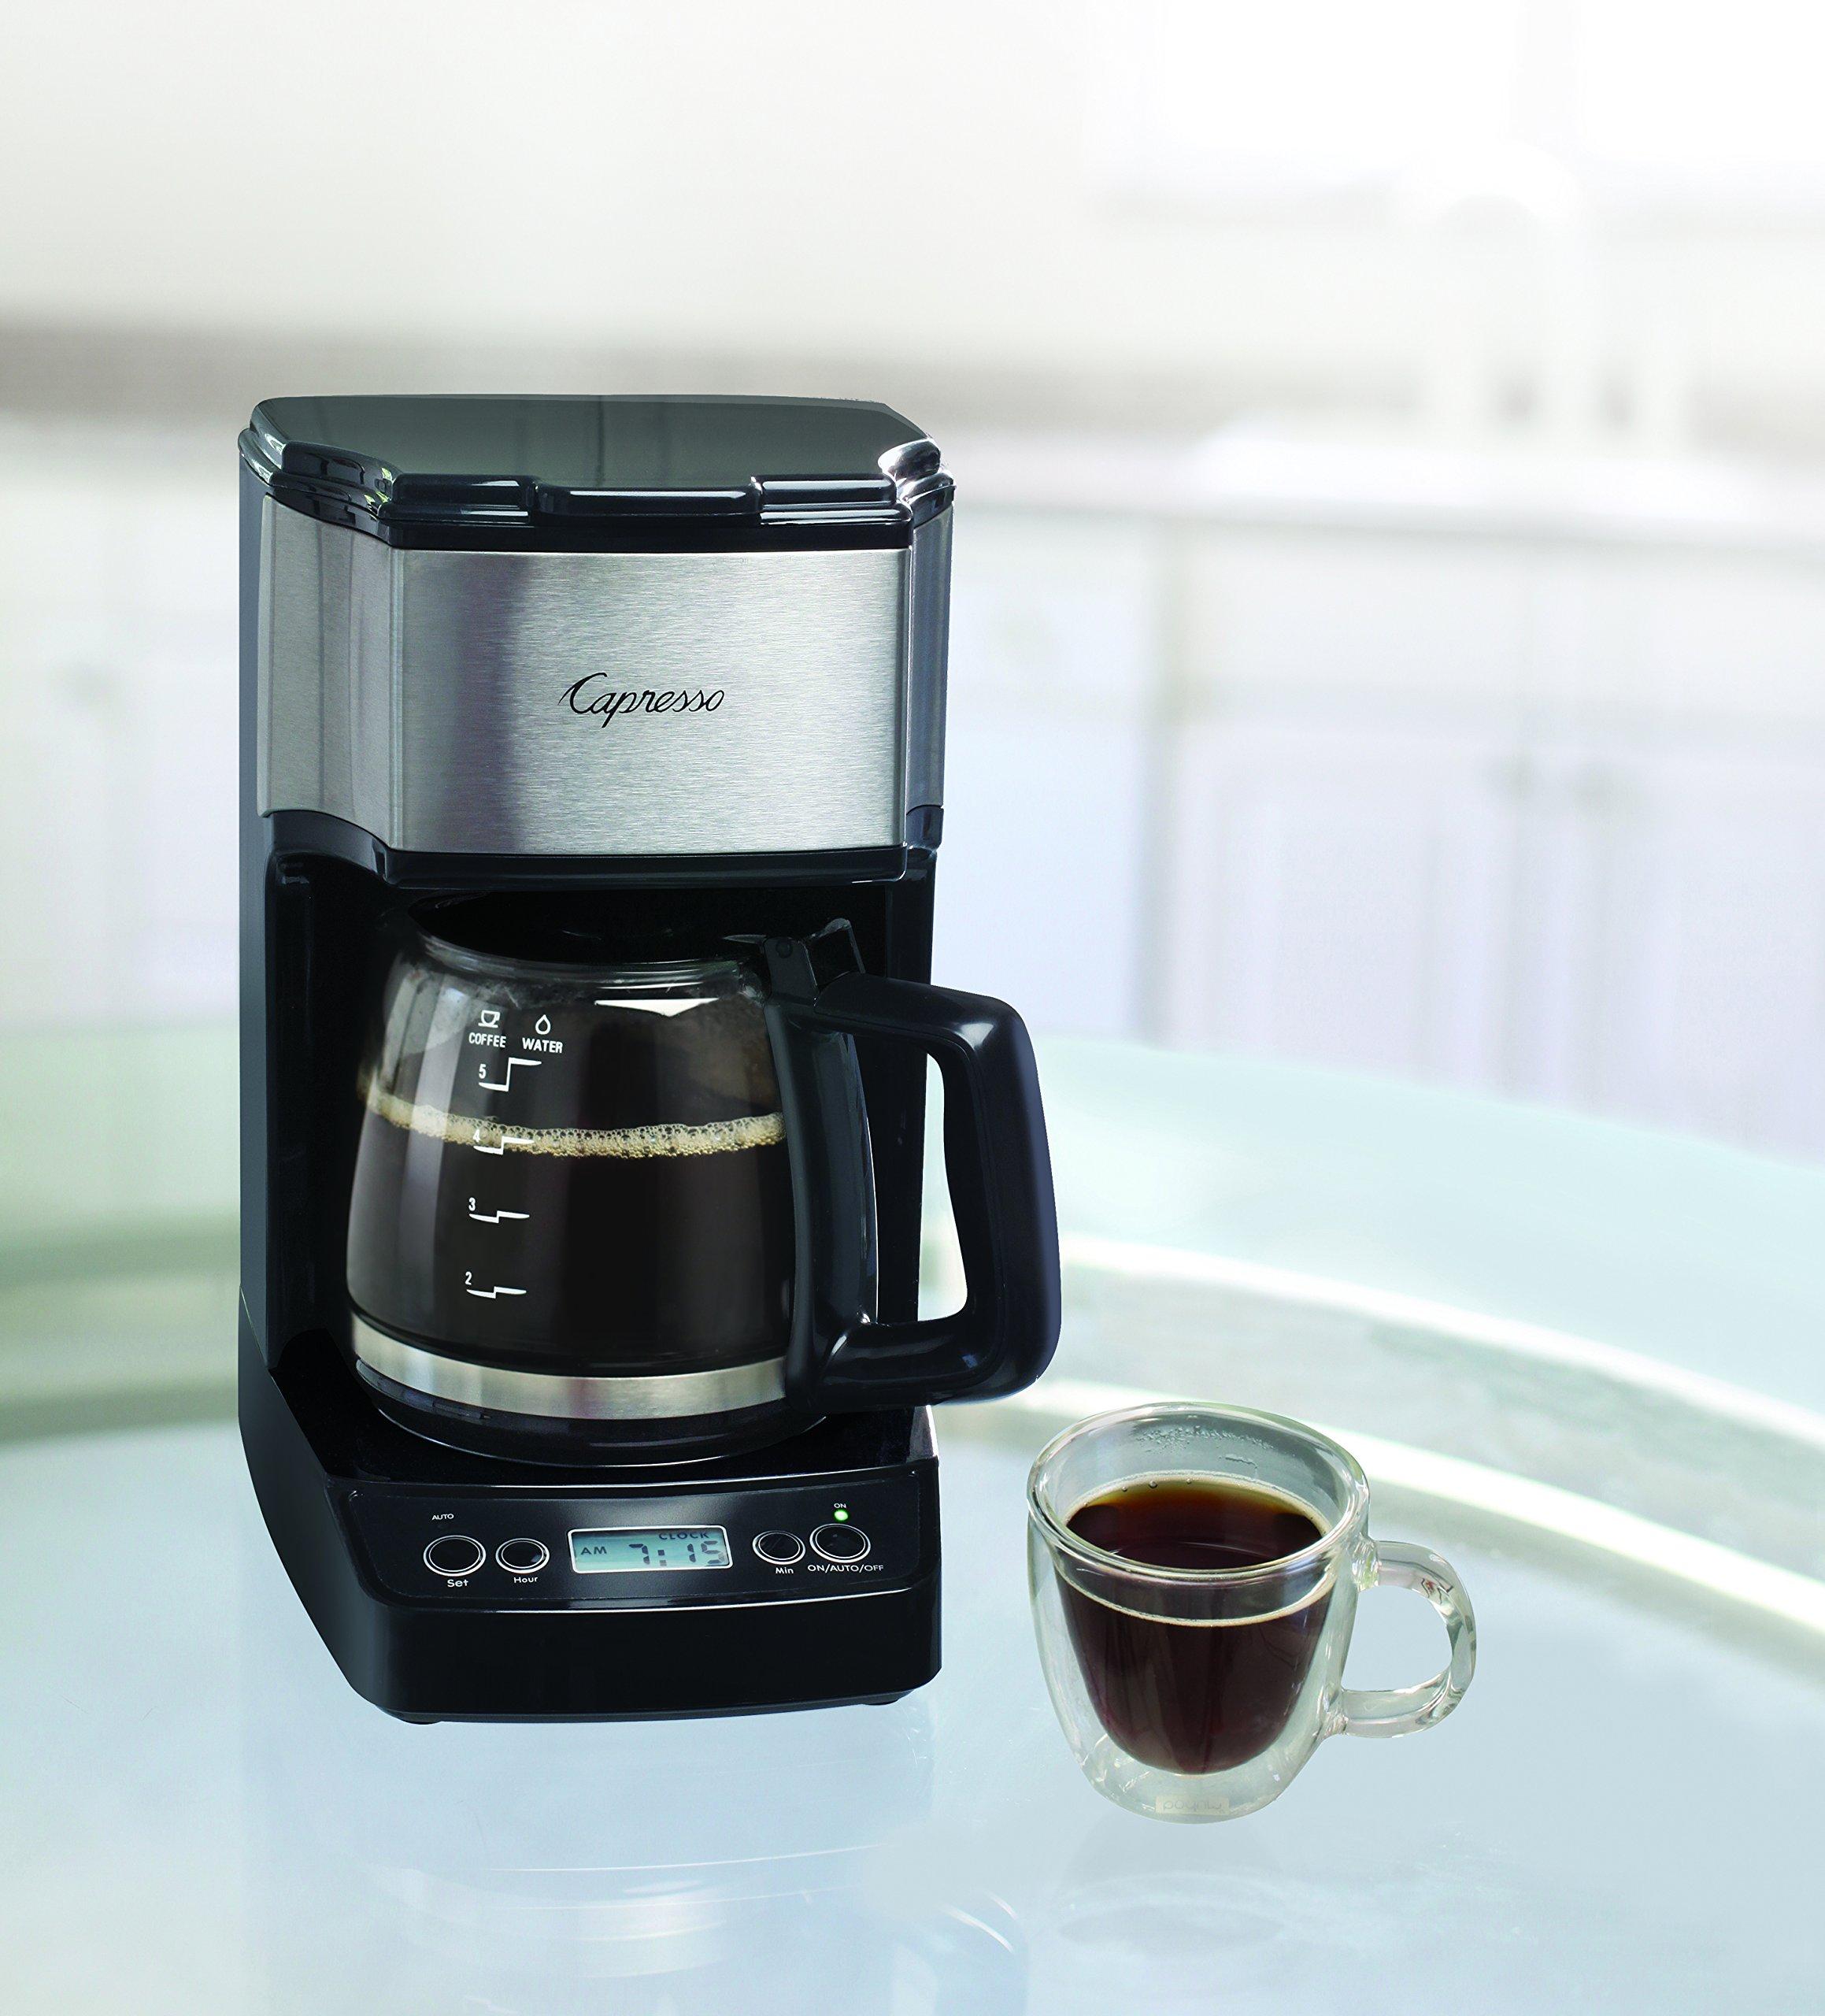 Capresso 426 05 5 Cup Coffeemaker Silver